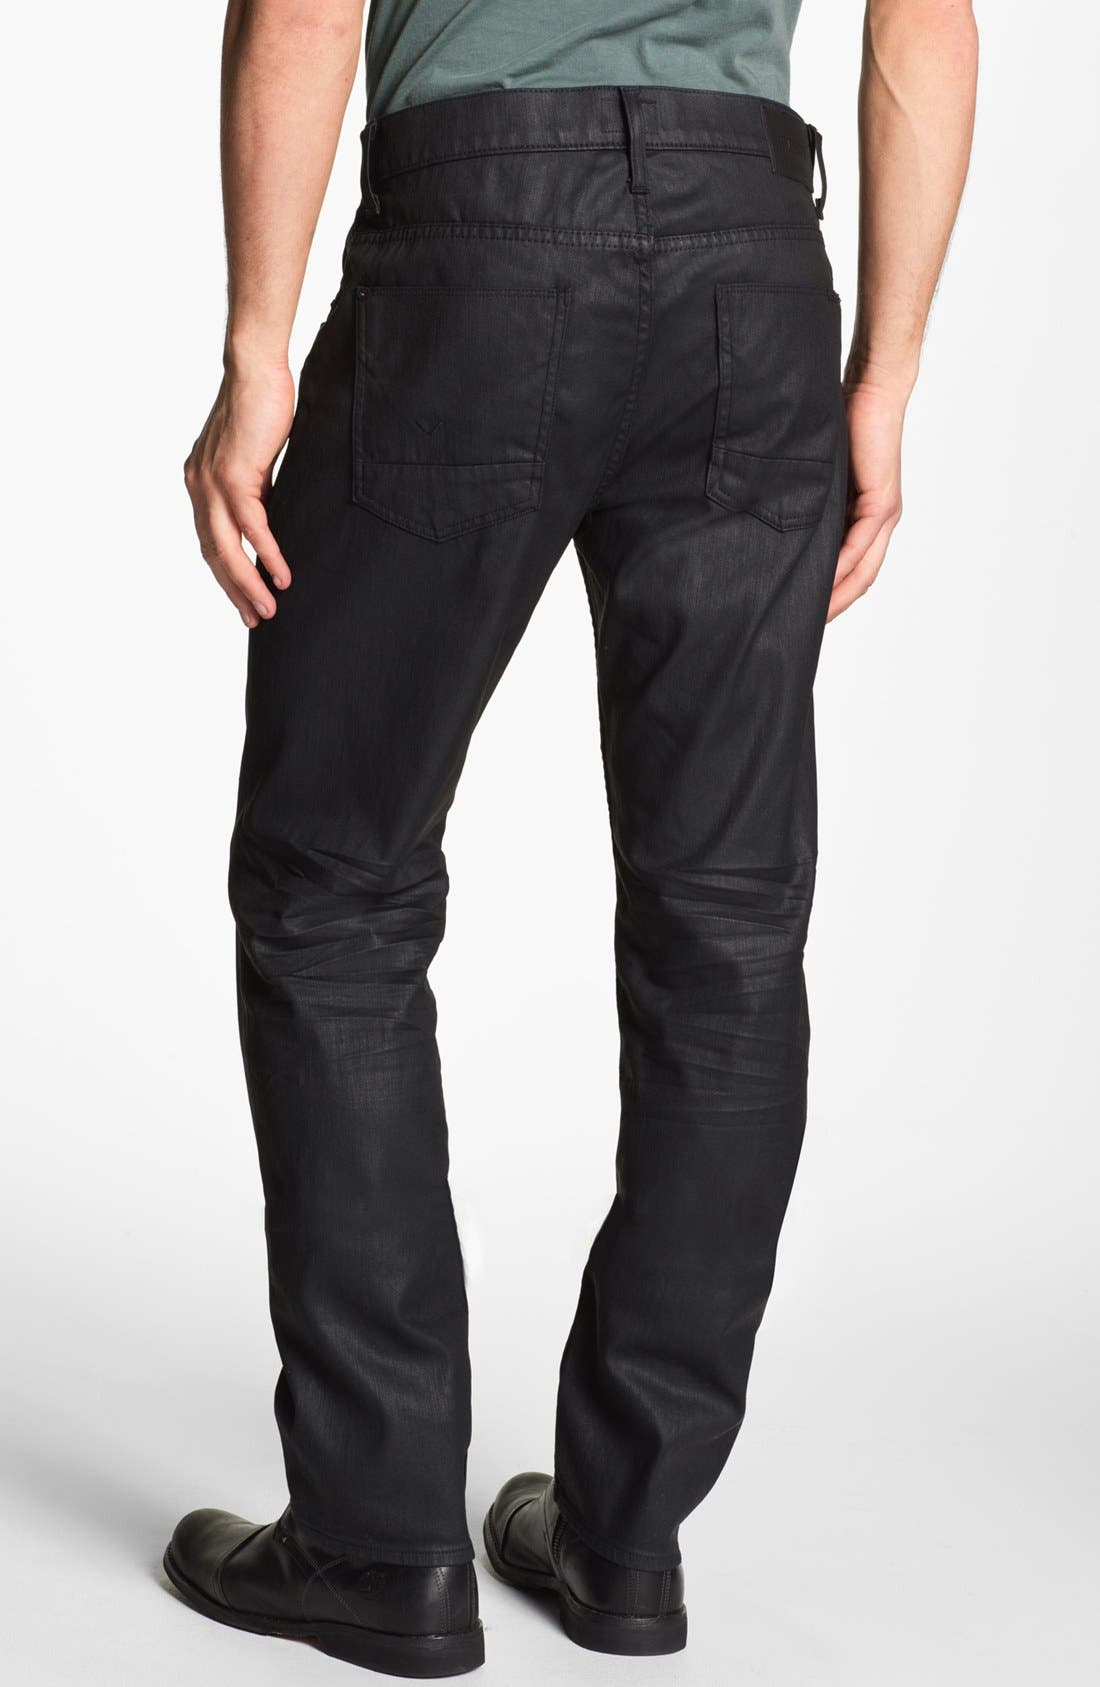 Main Image - Hudson Jeans 'Dandy' Slouchy Straight Leg Jeans (Tar)